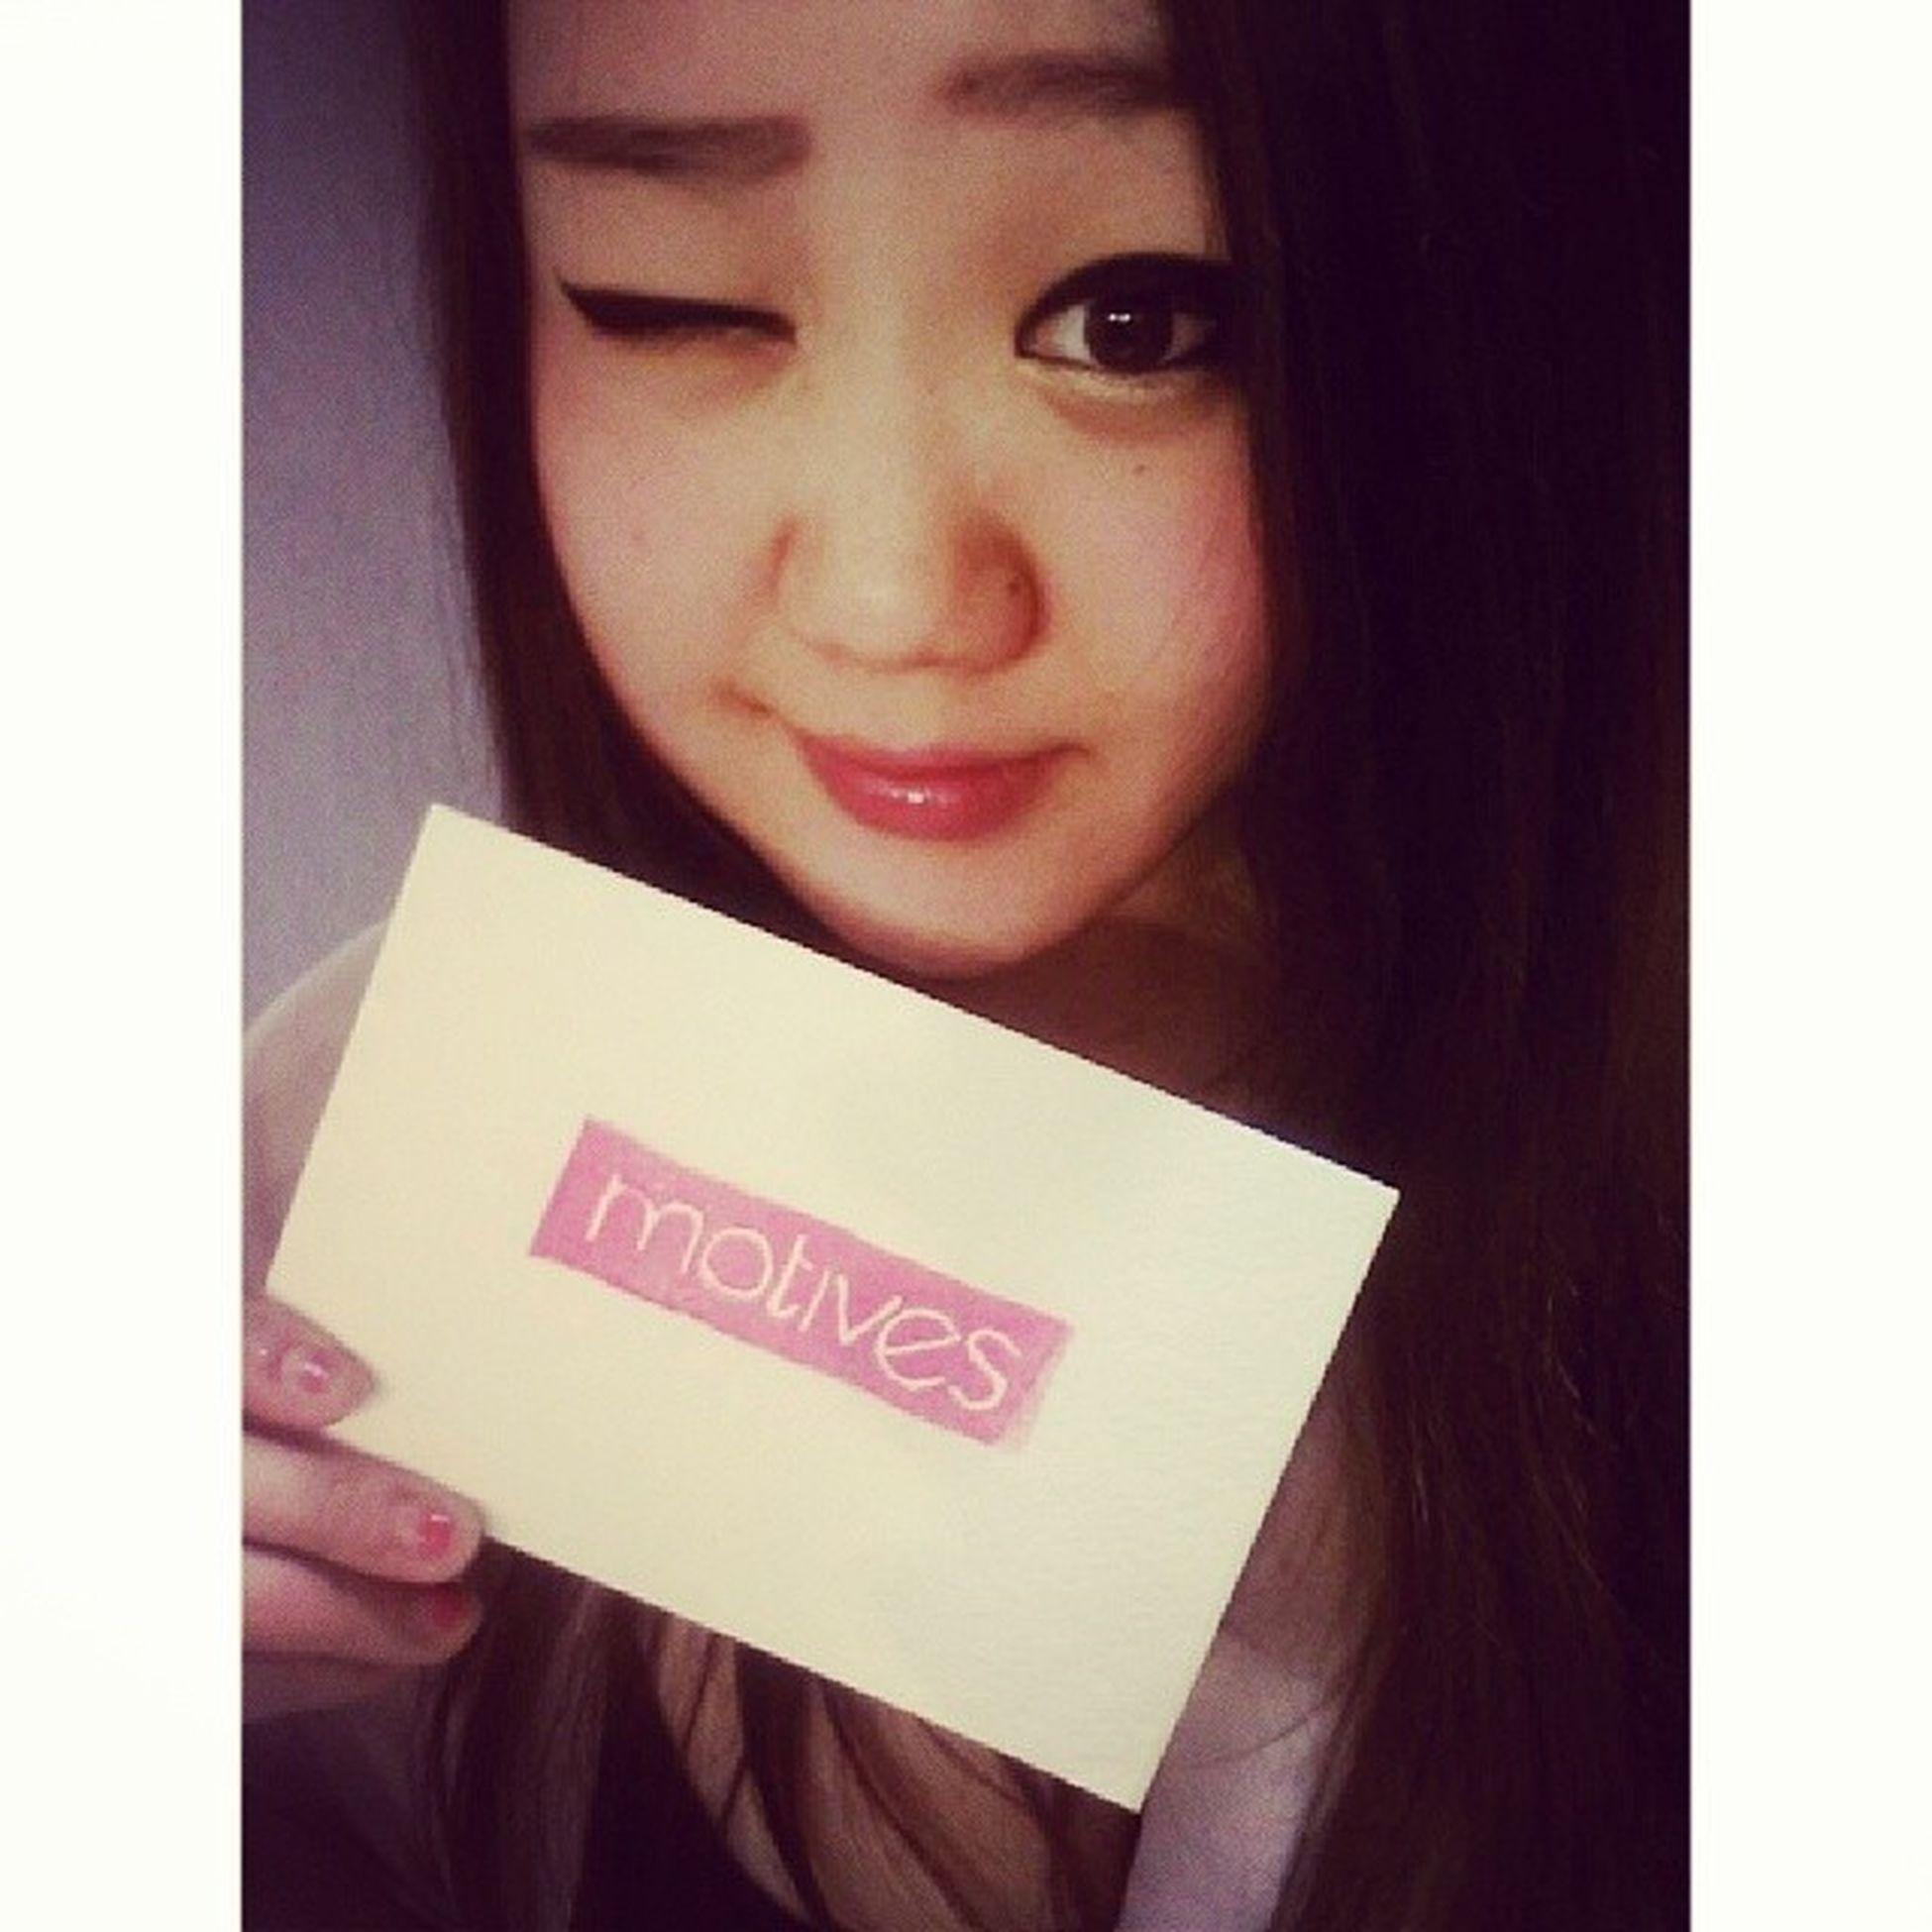 At la fabulous Motives cosmetics party! ♥ Mu30 Genyto Motivescosmetics Motivesgirls selca korean koreangirl asiangirl asian 얼짱 셀카 한국인 ulzzang uljkang instagood instamood fotd selfie tgif